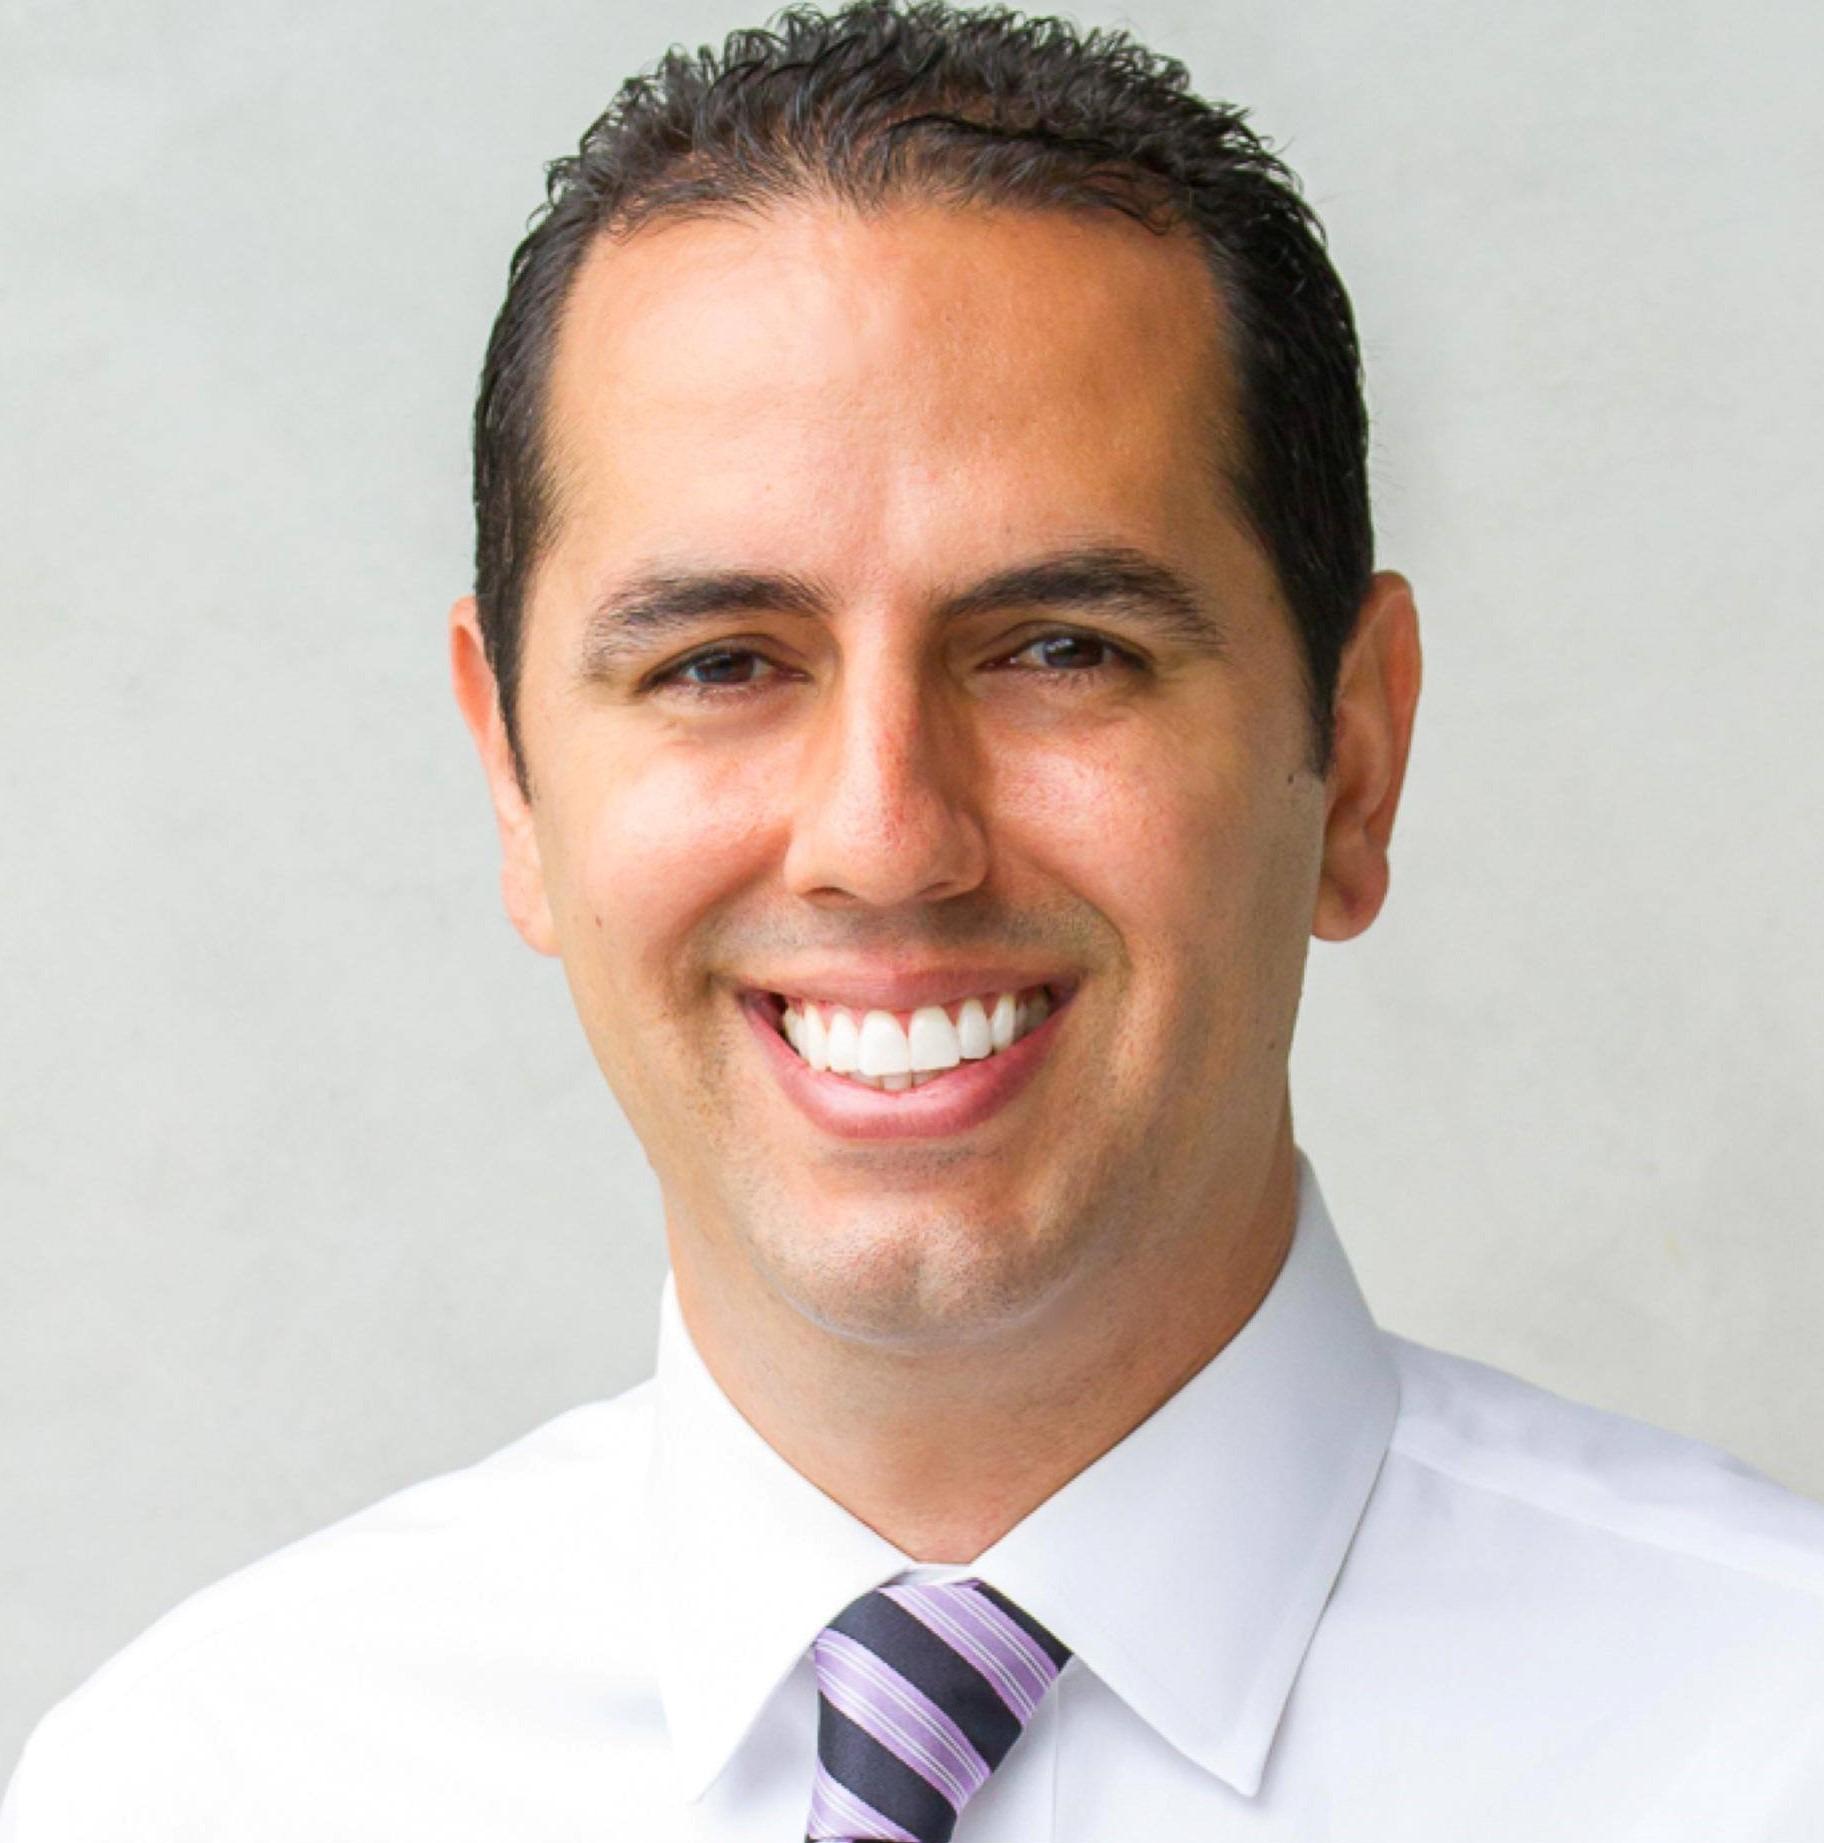 Yosi-Behroozan-dentist